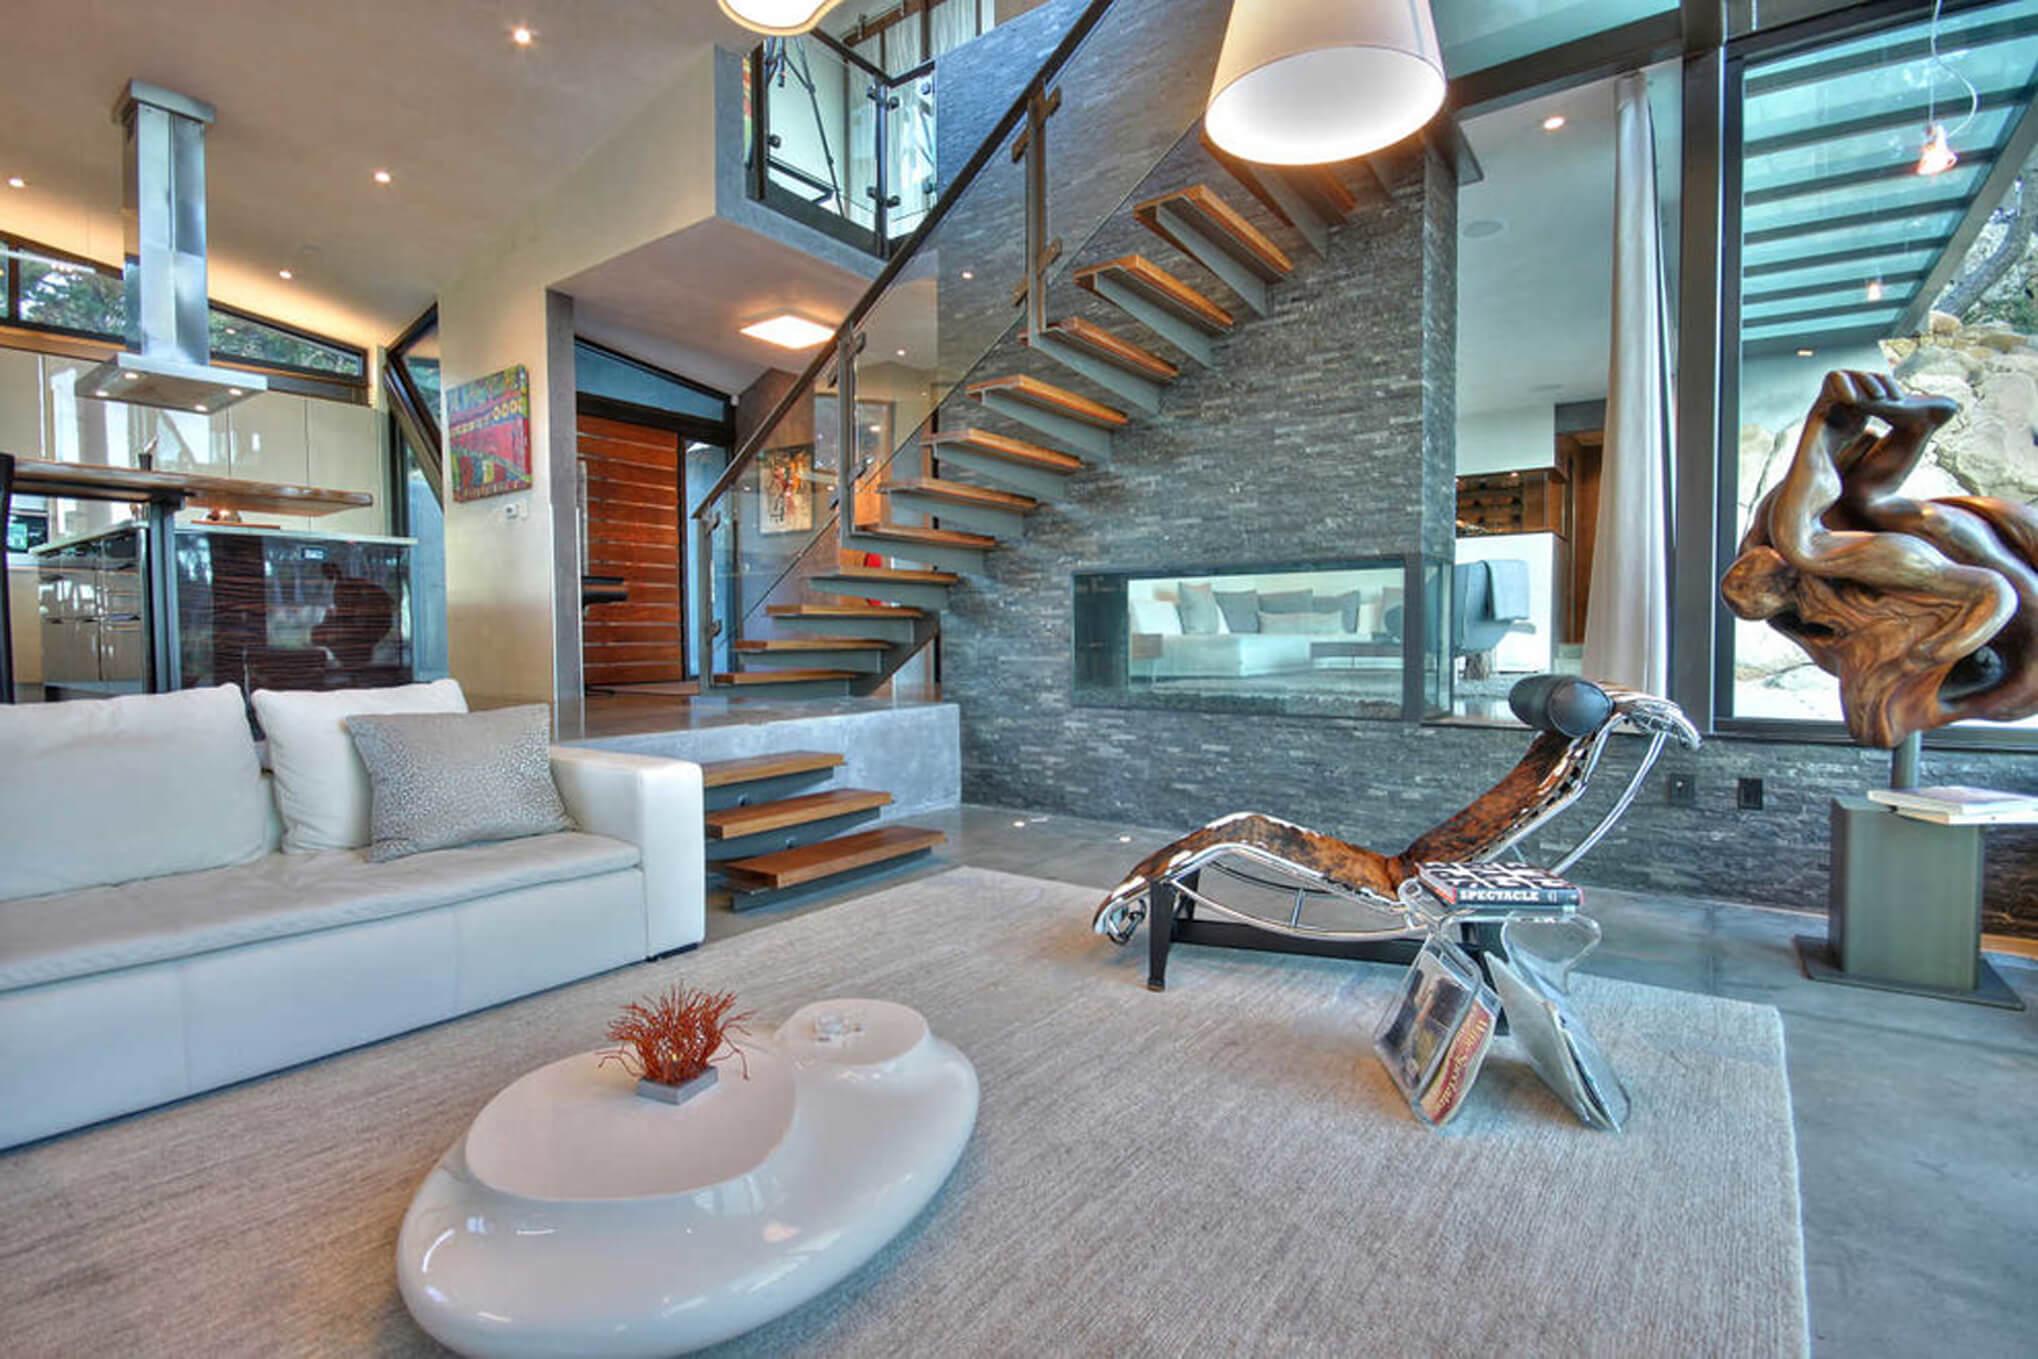 California modern living room designed by Cincinnati's premiere interior designer, RM Interiors.